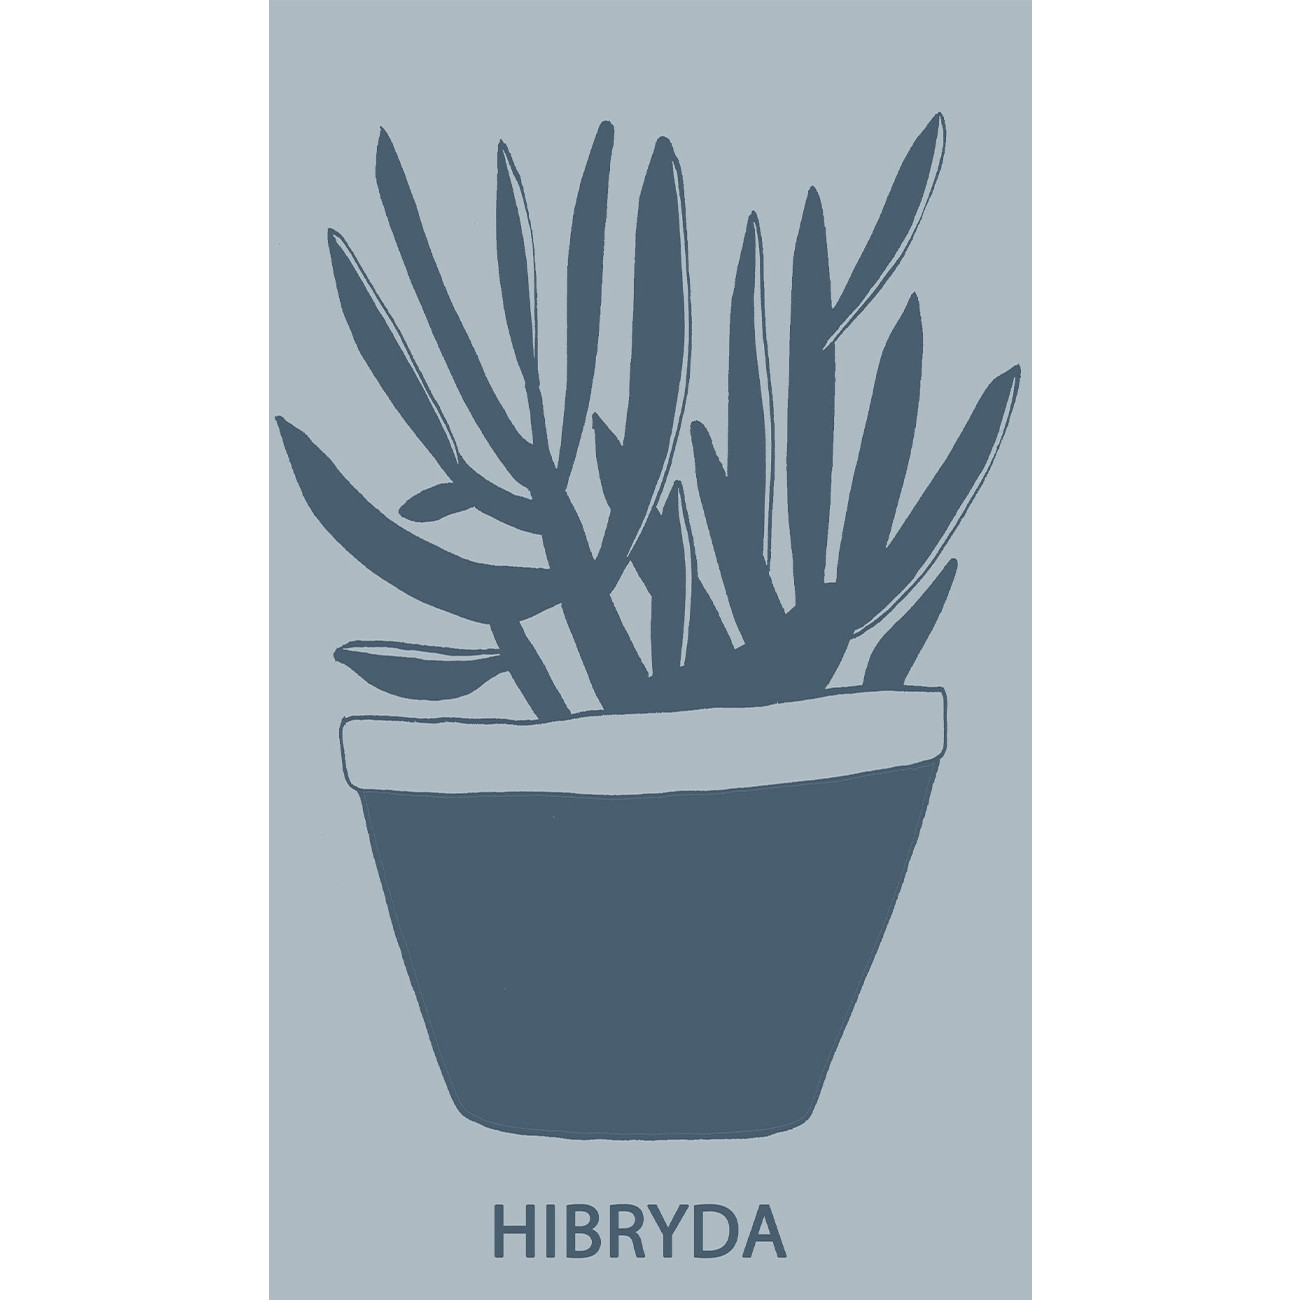 hibryda